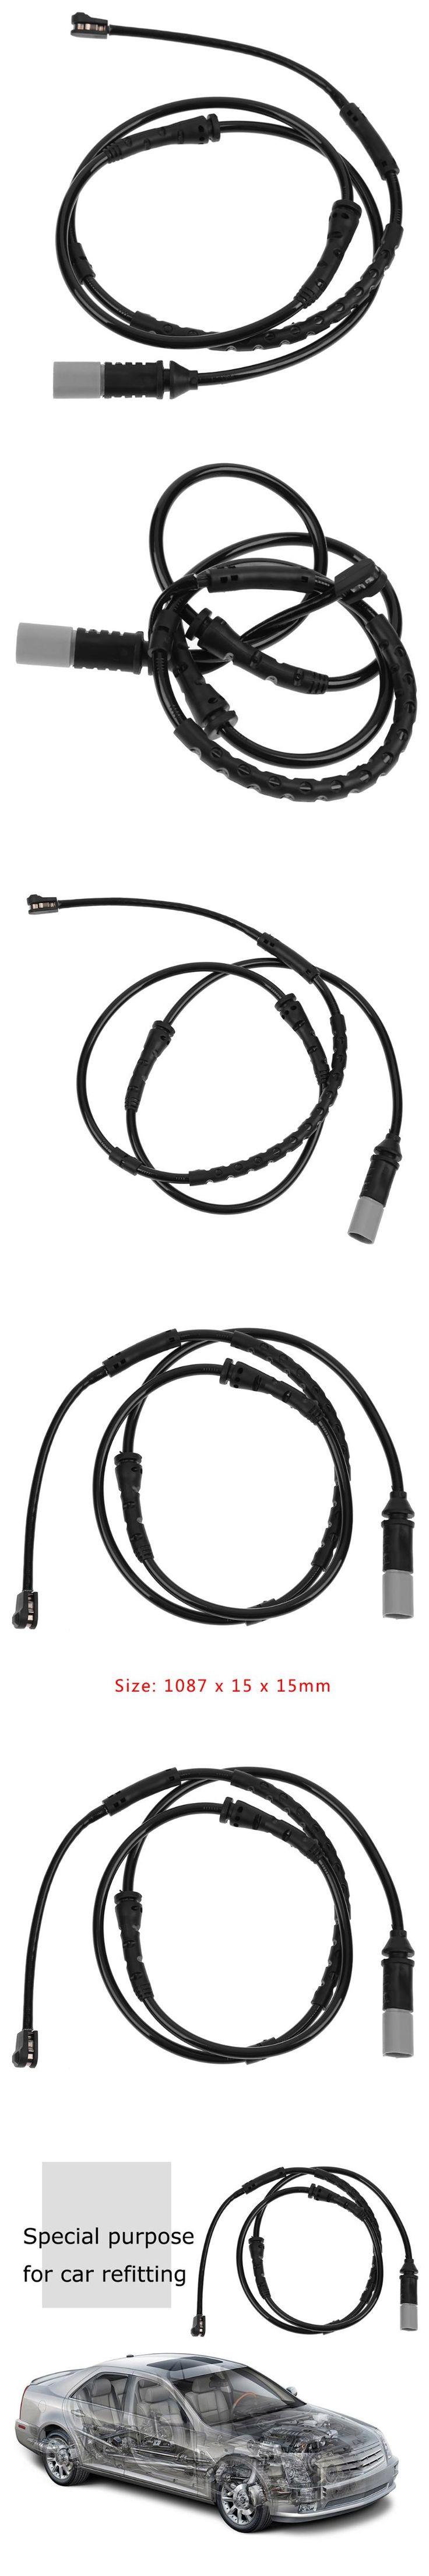 1Pcs Front Brake Pad Wear Sensor for BMW F07 535i 535iX F10 528i 34356791958 Auto Car Brake Systems Brake Wear Sensor Alarm New